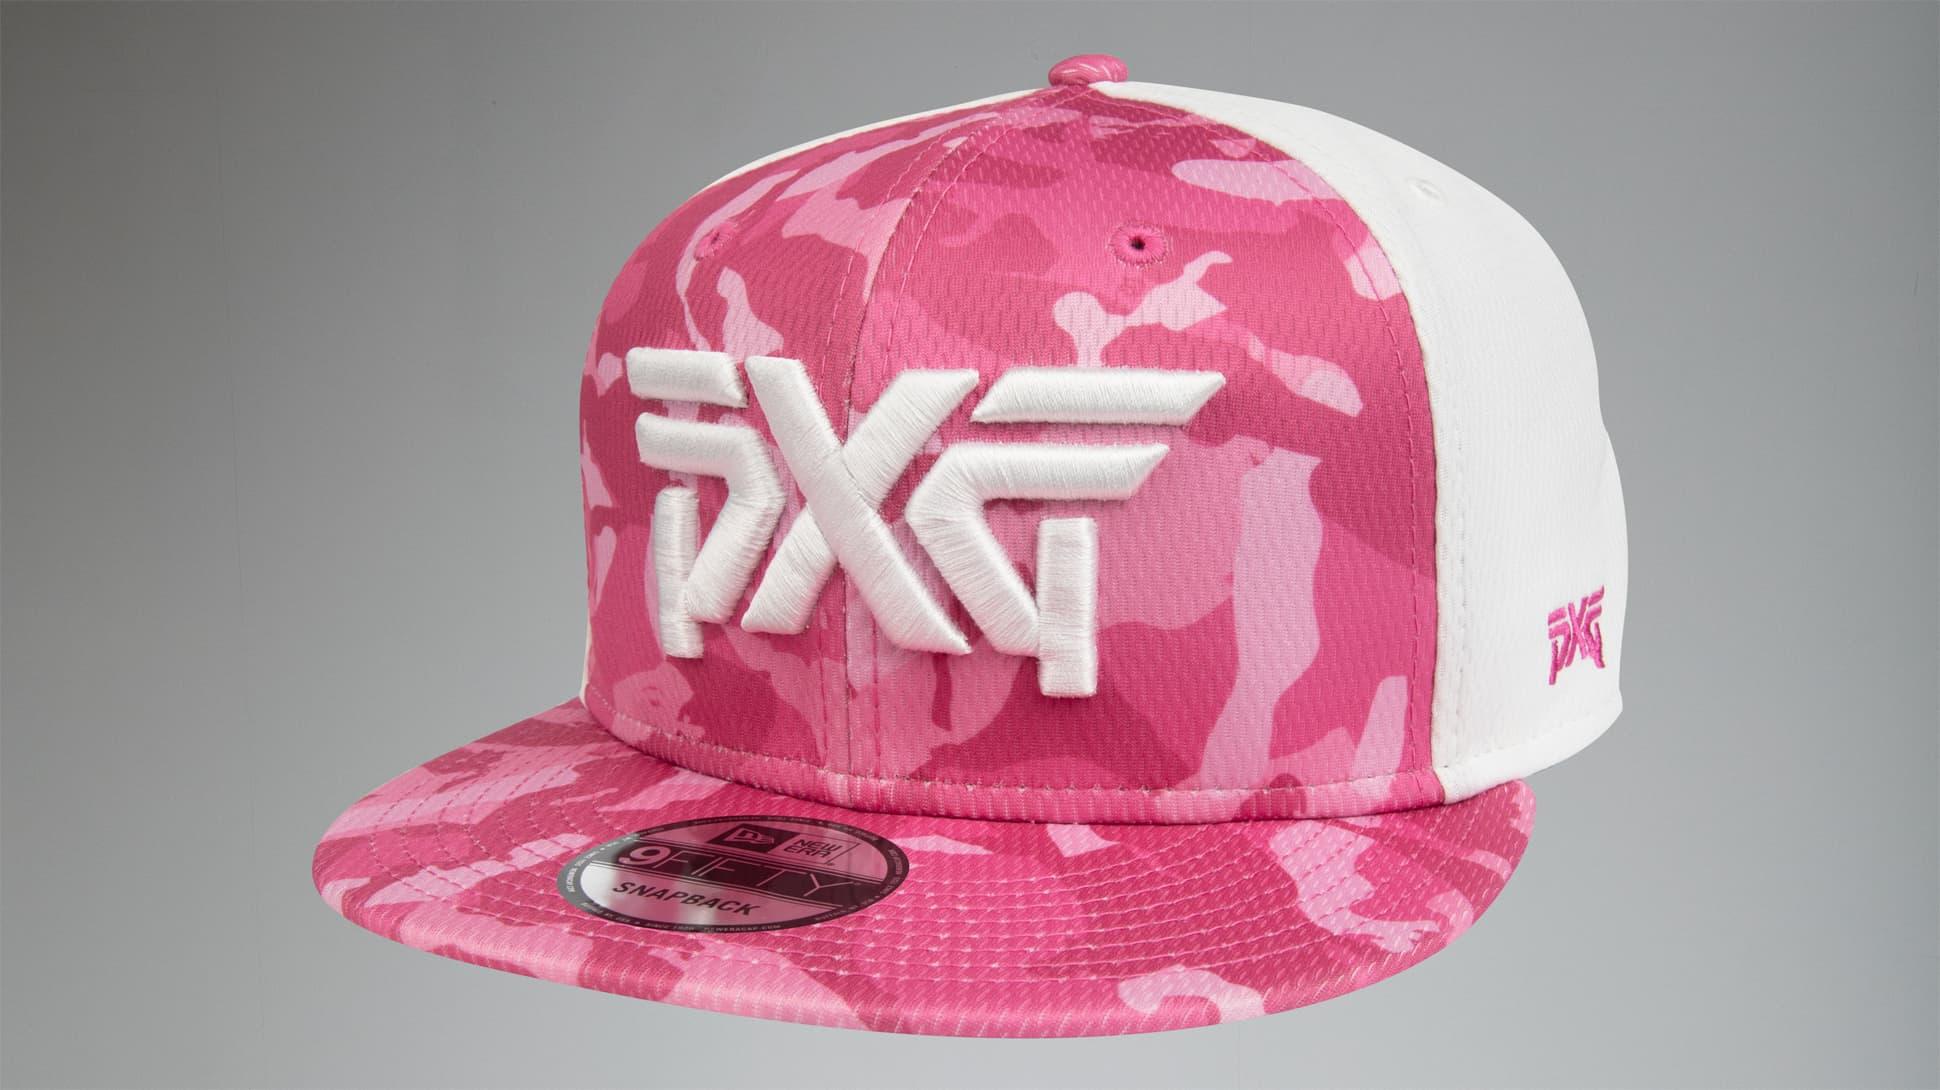 Fairway Camo™ Pink 9FIFTY Snapback Cap Image 1